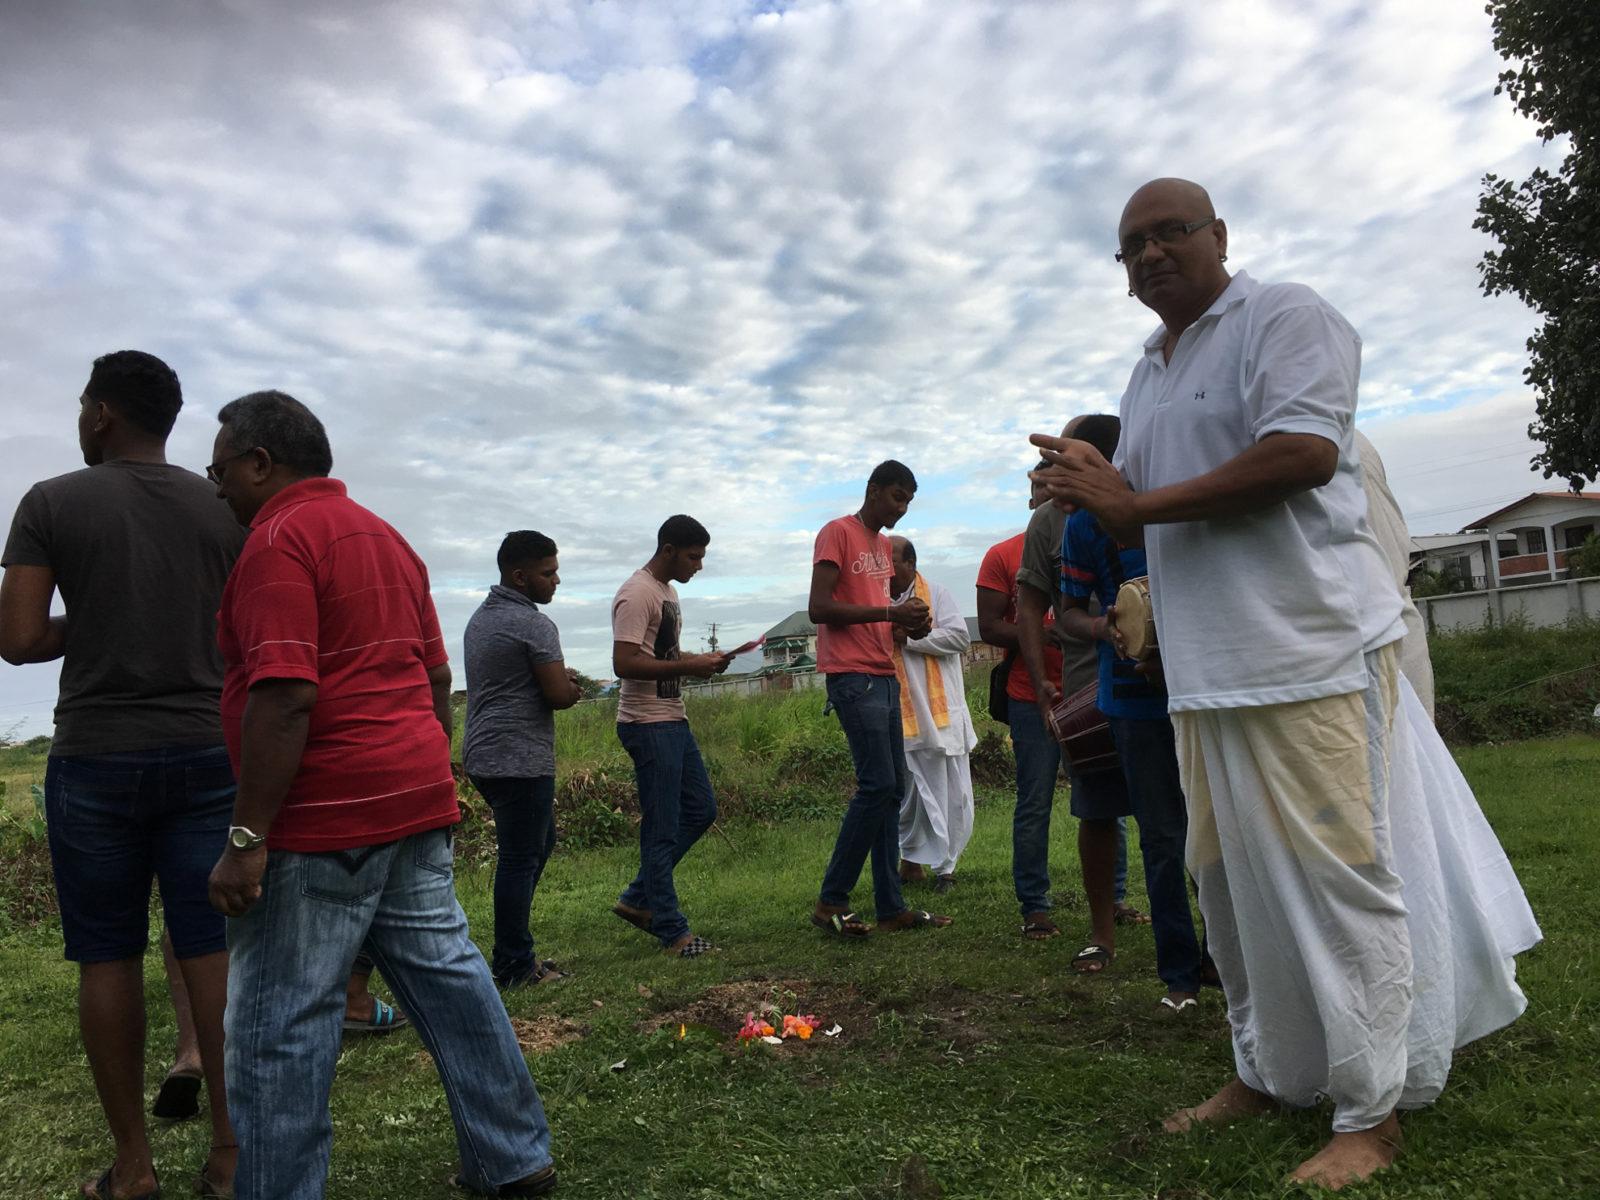 Radjes-Ashraf-en-hindoe-ceremonie-5